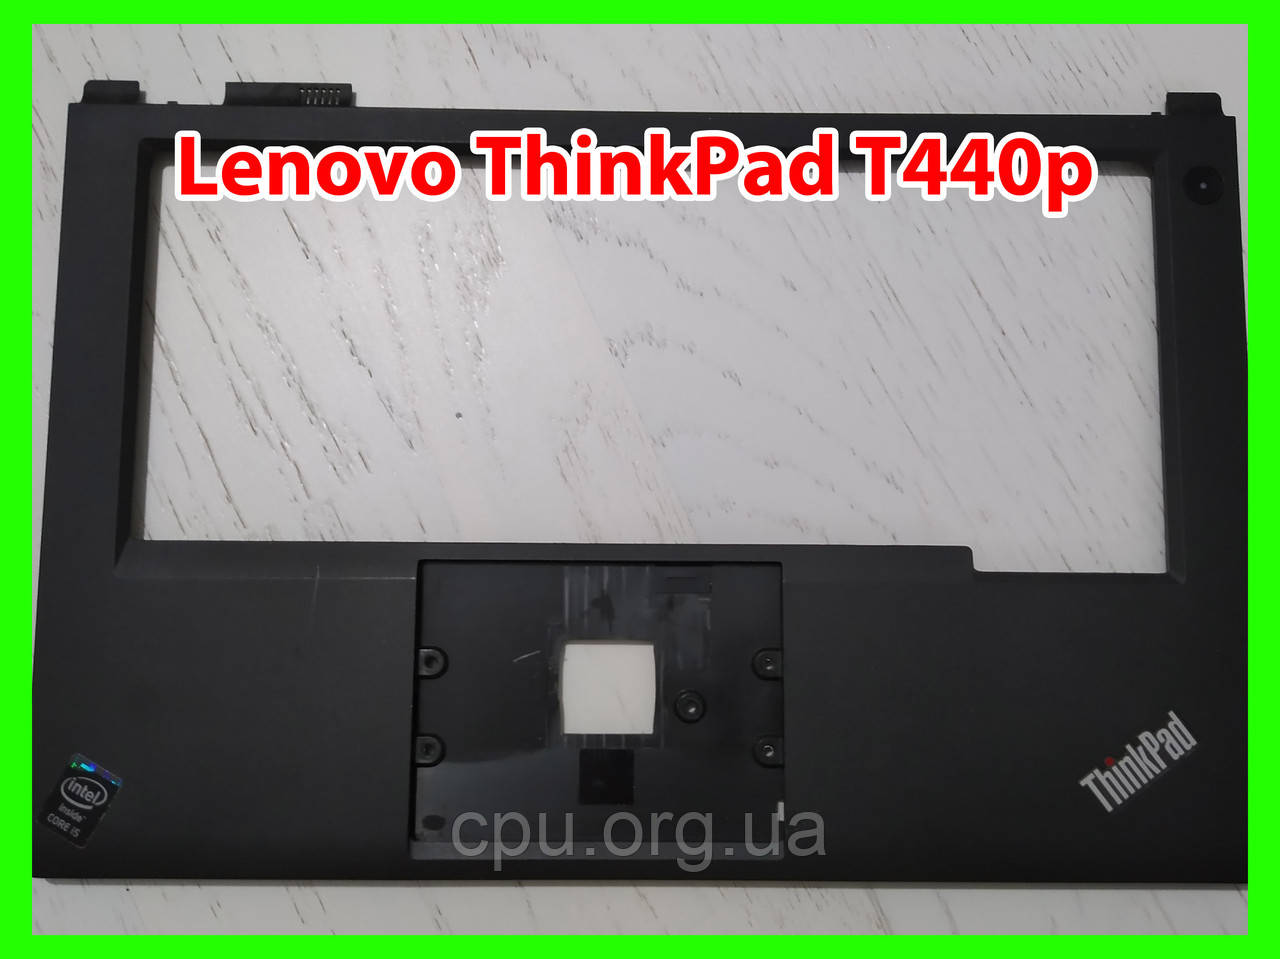 Palmrest Topcase верхня частина корпусу Lenovo ThinkPad T440p